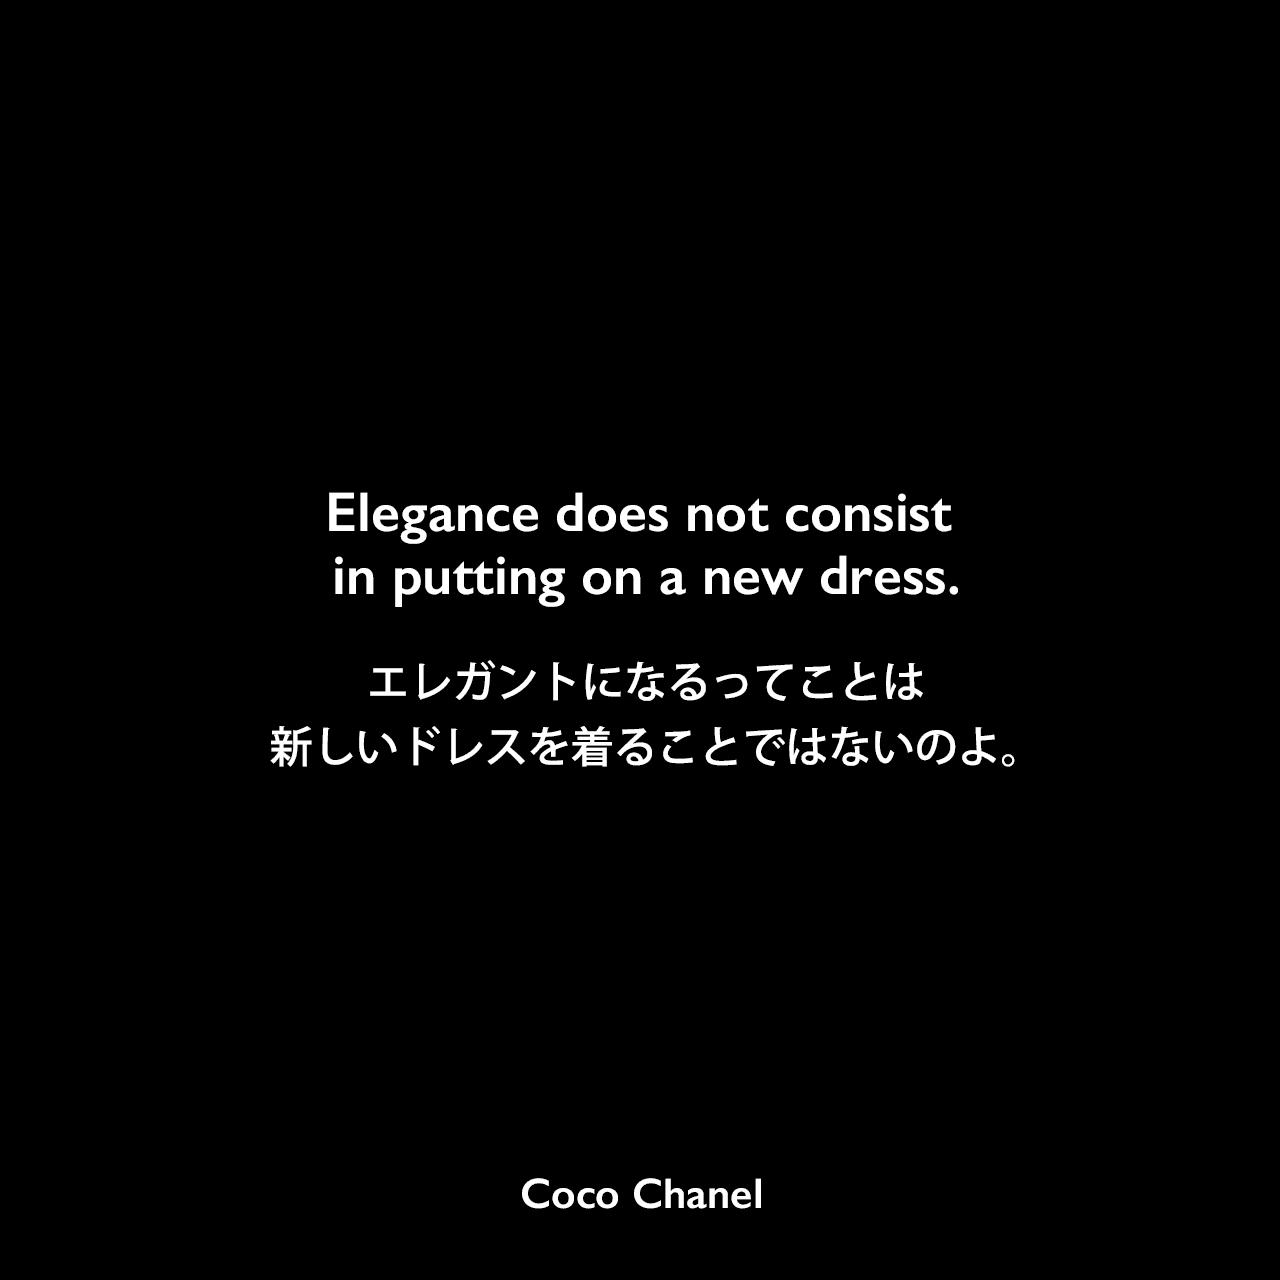 Elegance does not consist in putting on a new dress.エレガントになるってことは、新しいドレスを着ることではないのよ。Coco Chanel